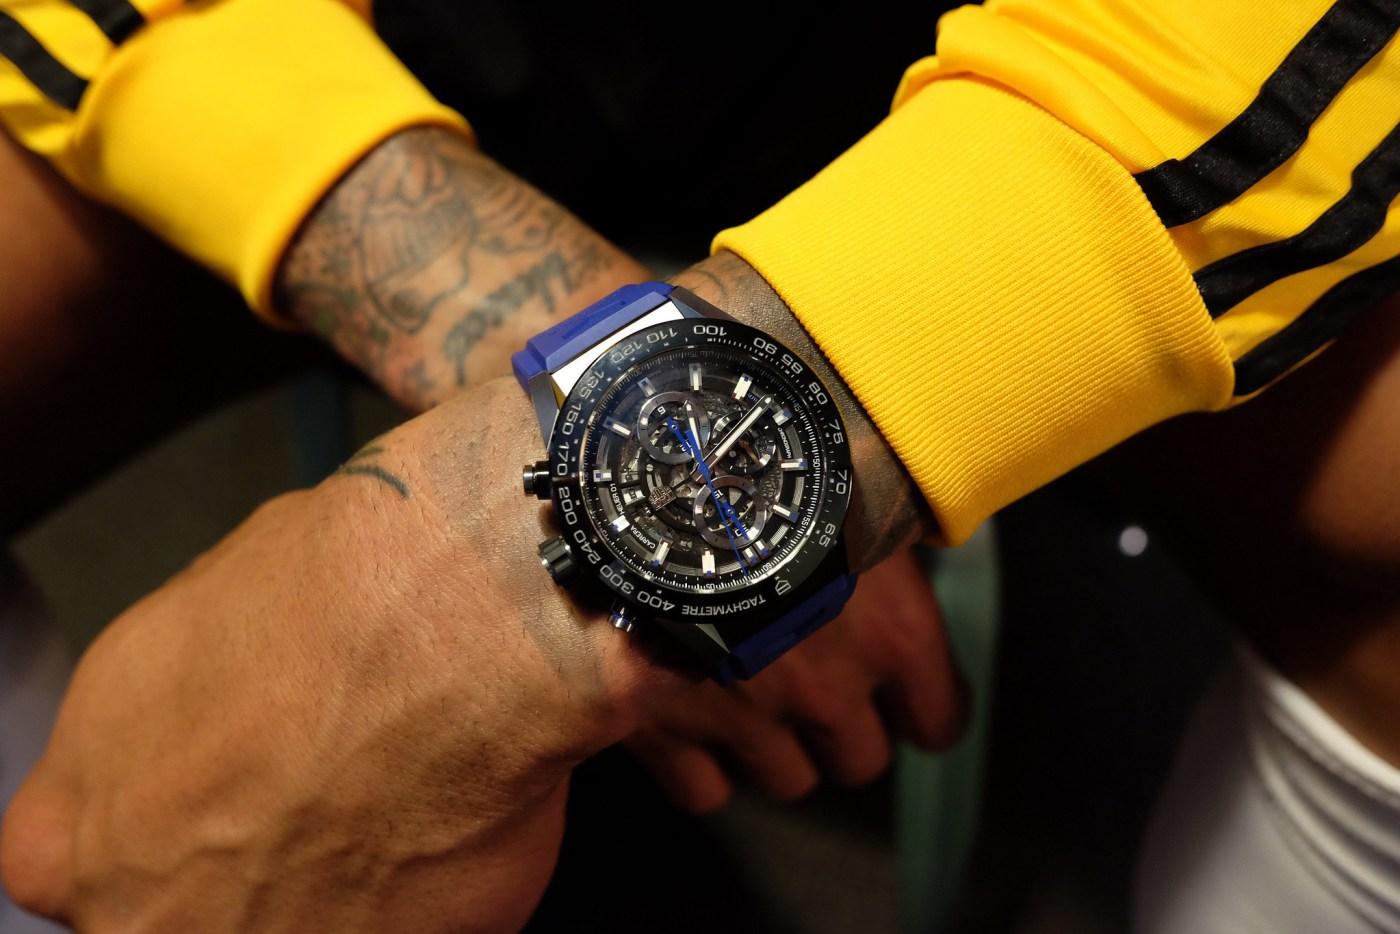 Tim Howard wristshot with his TAG Heuer Carrera